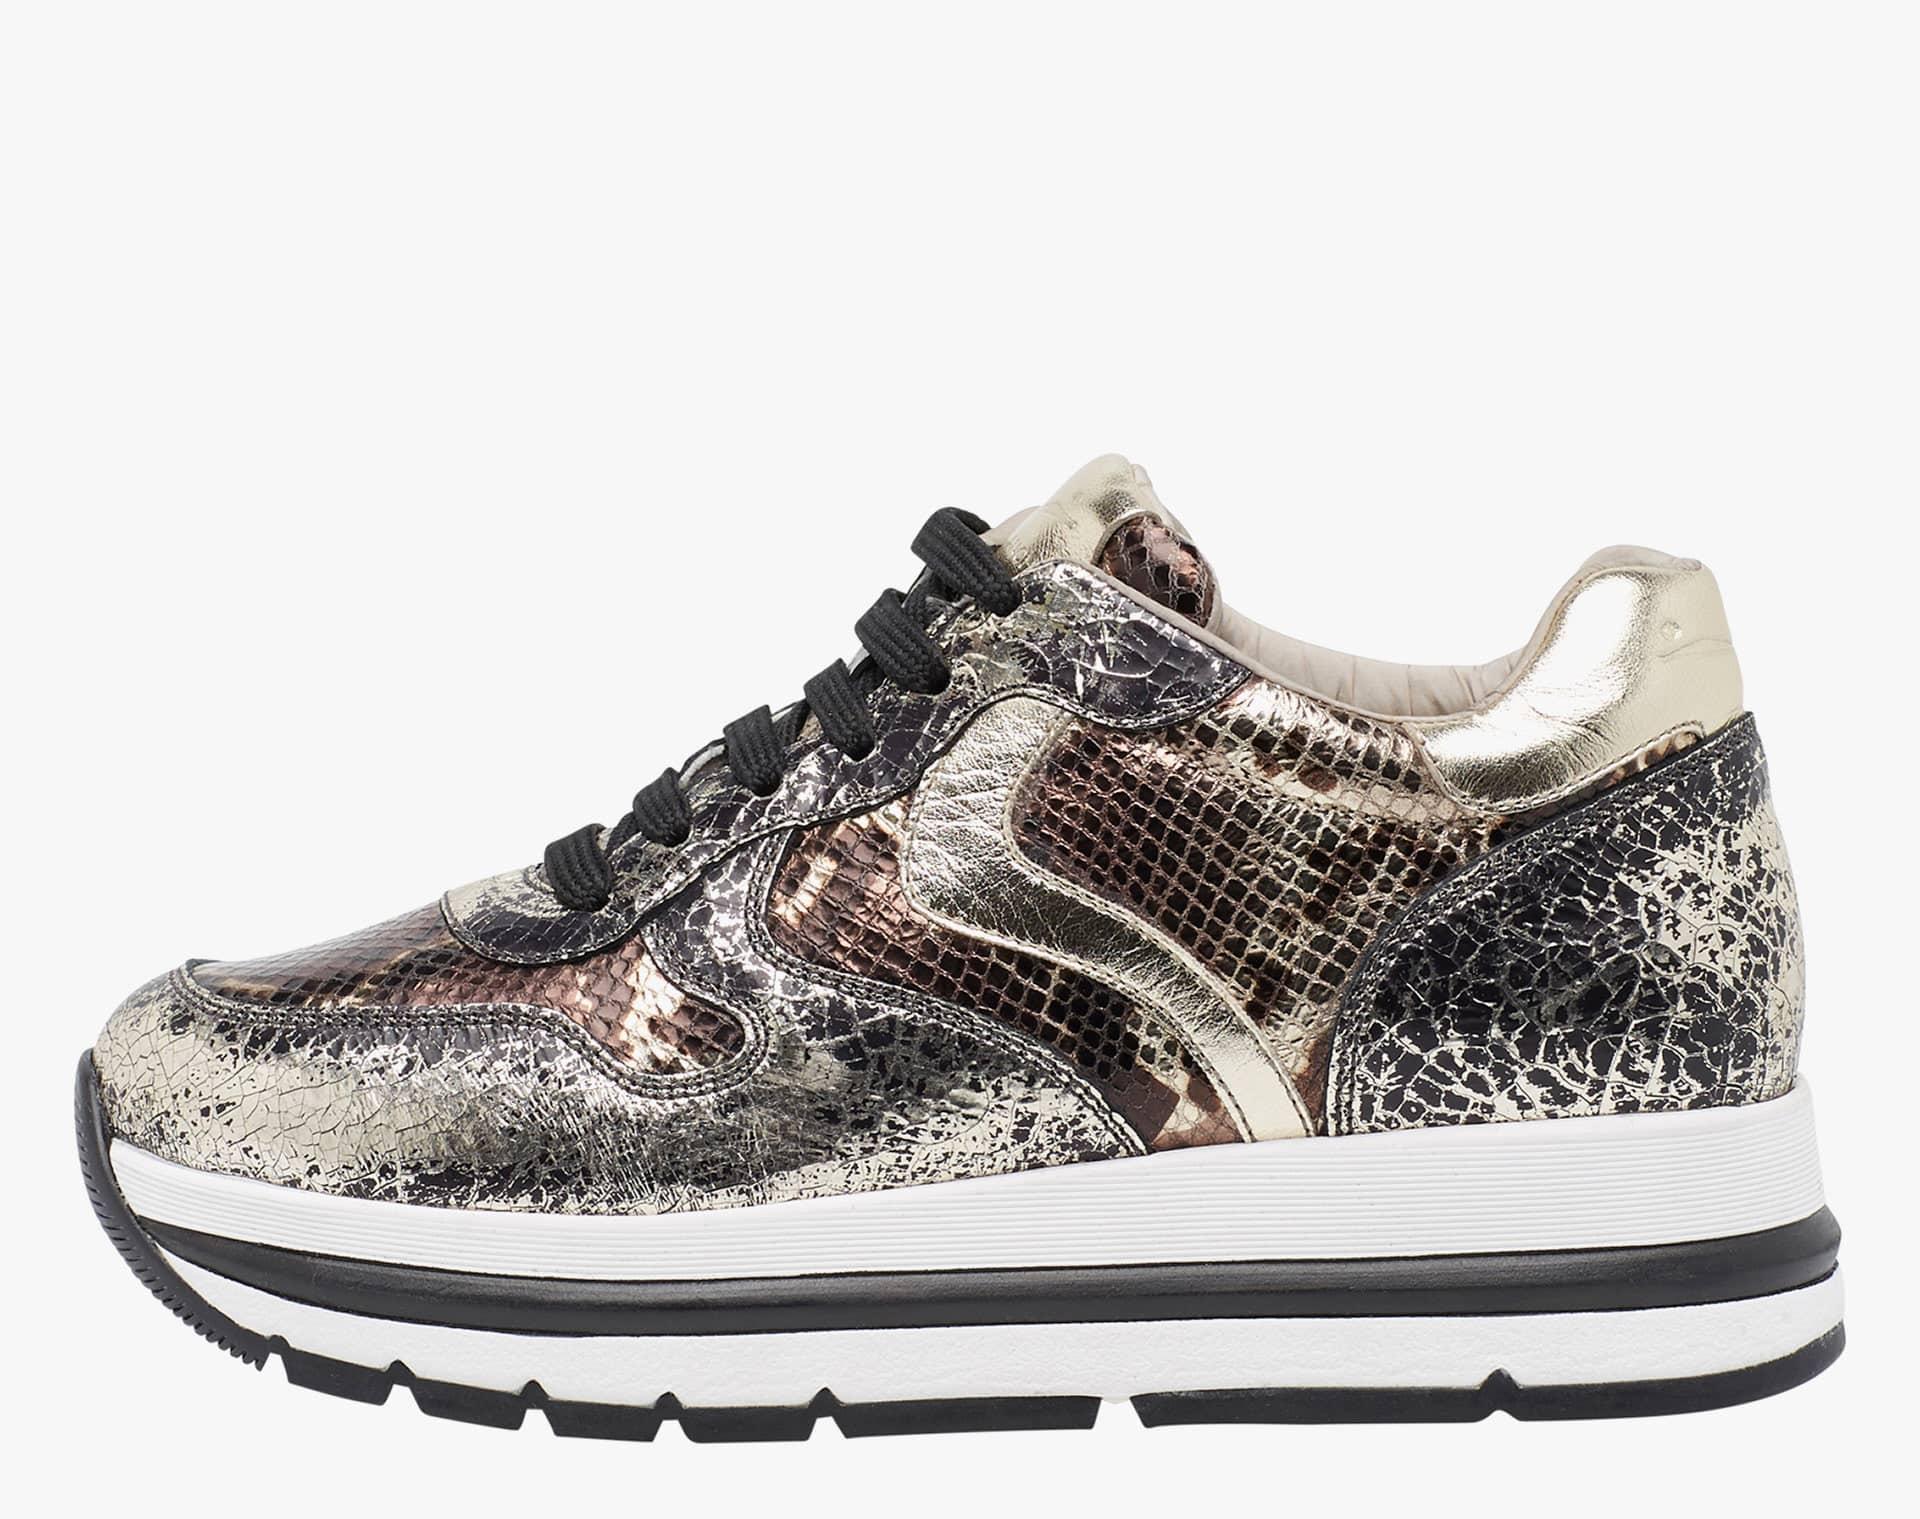 MARAN - Sneaker con pelle craquel� - Platino/Beige